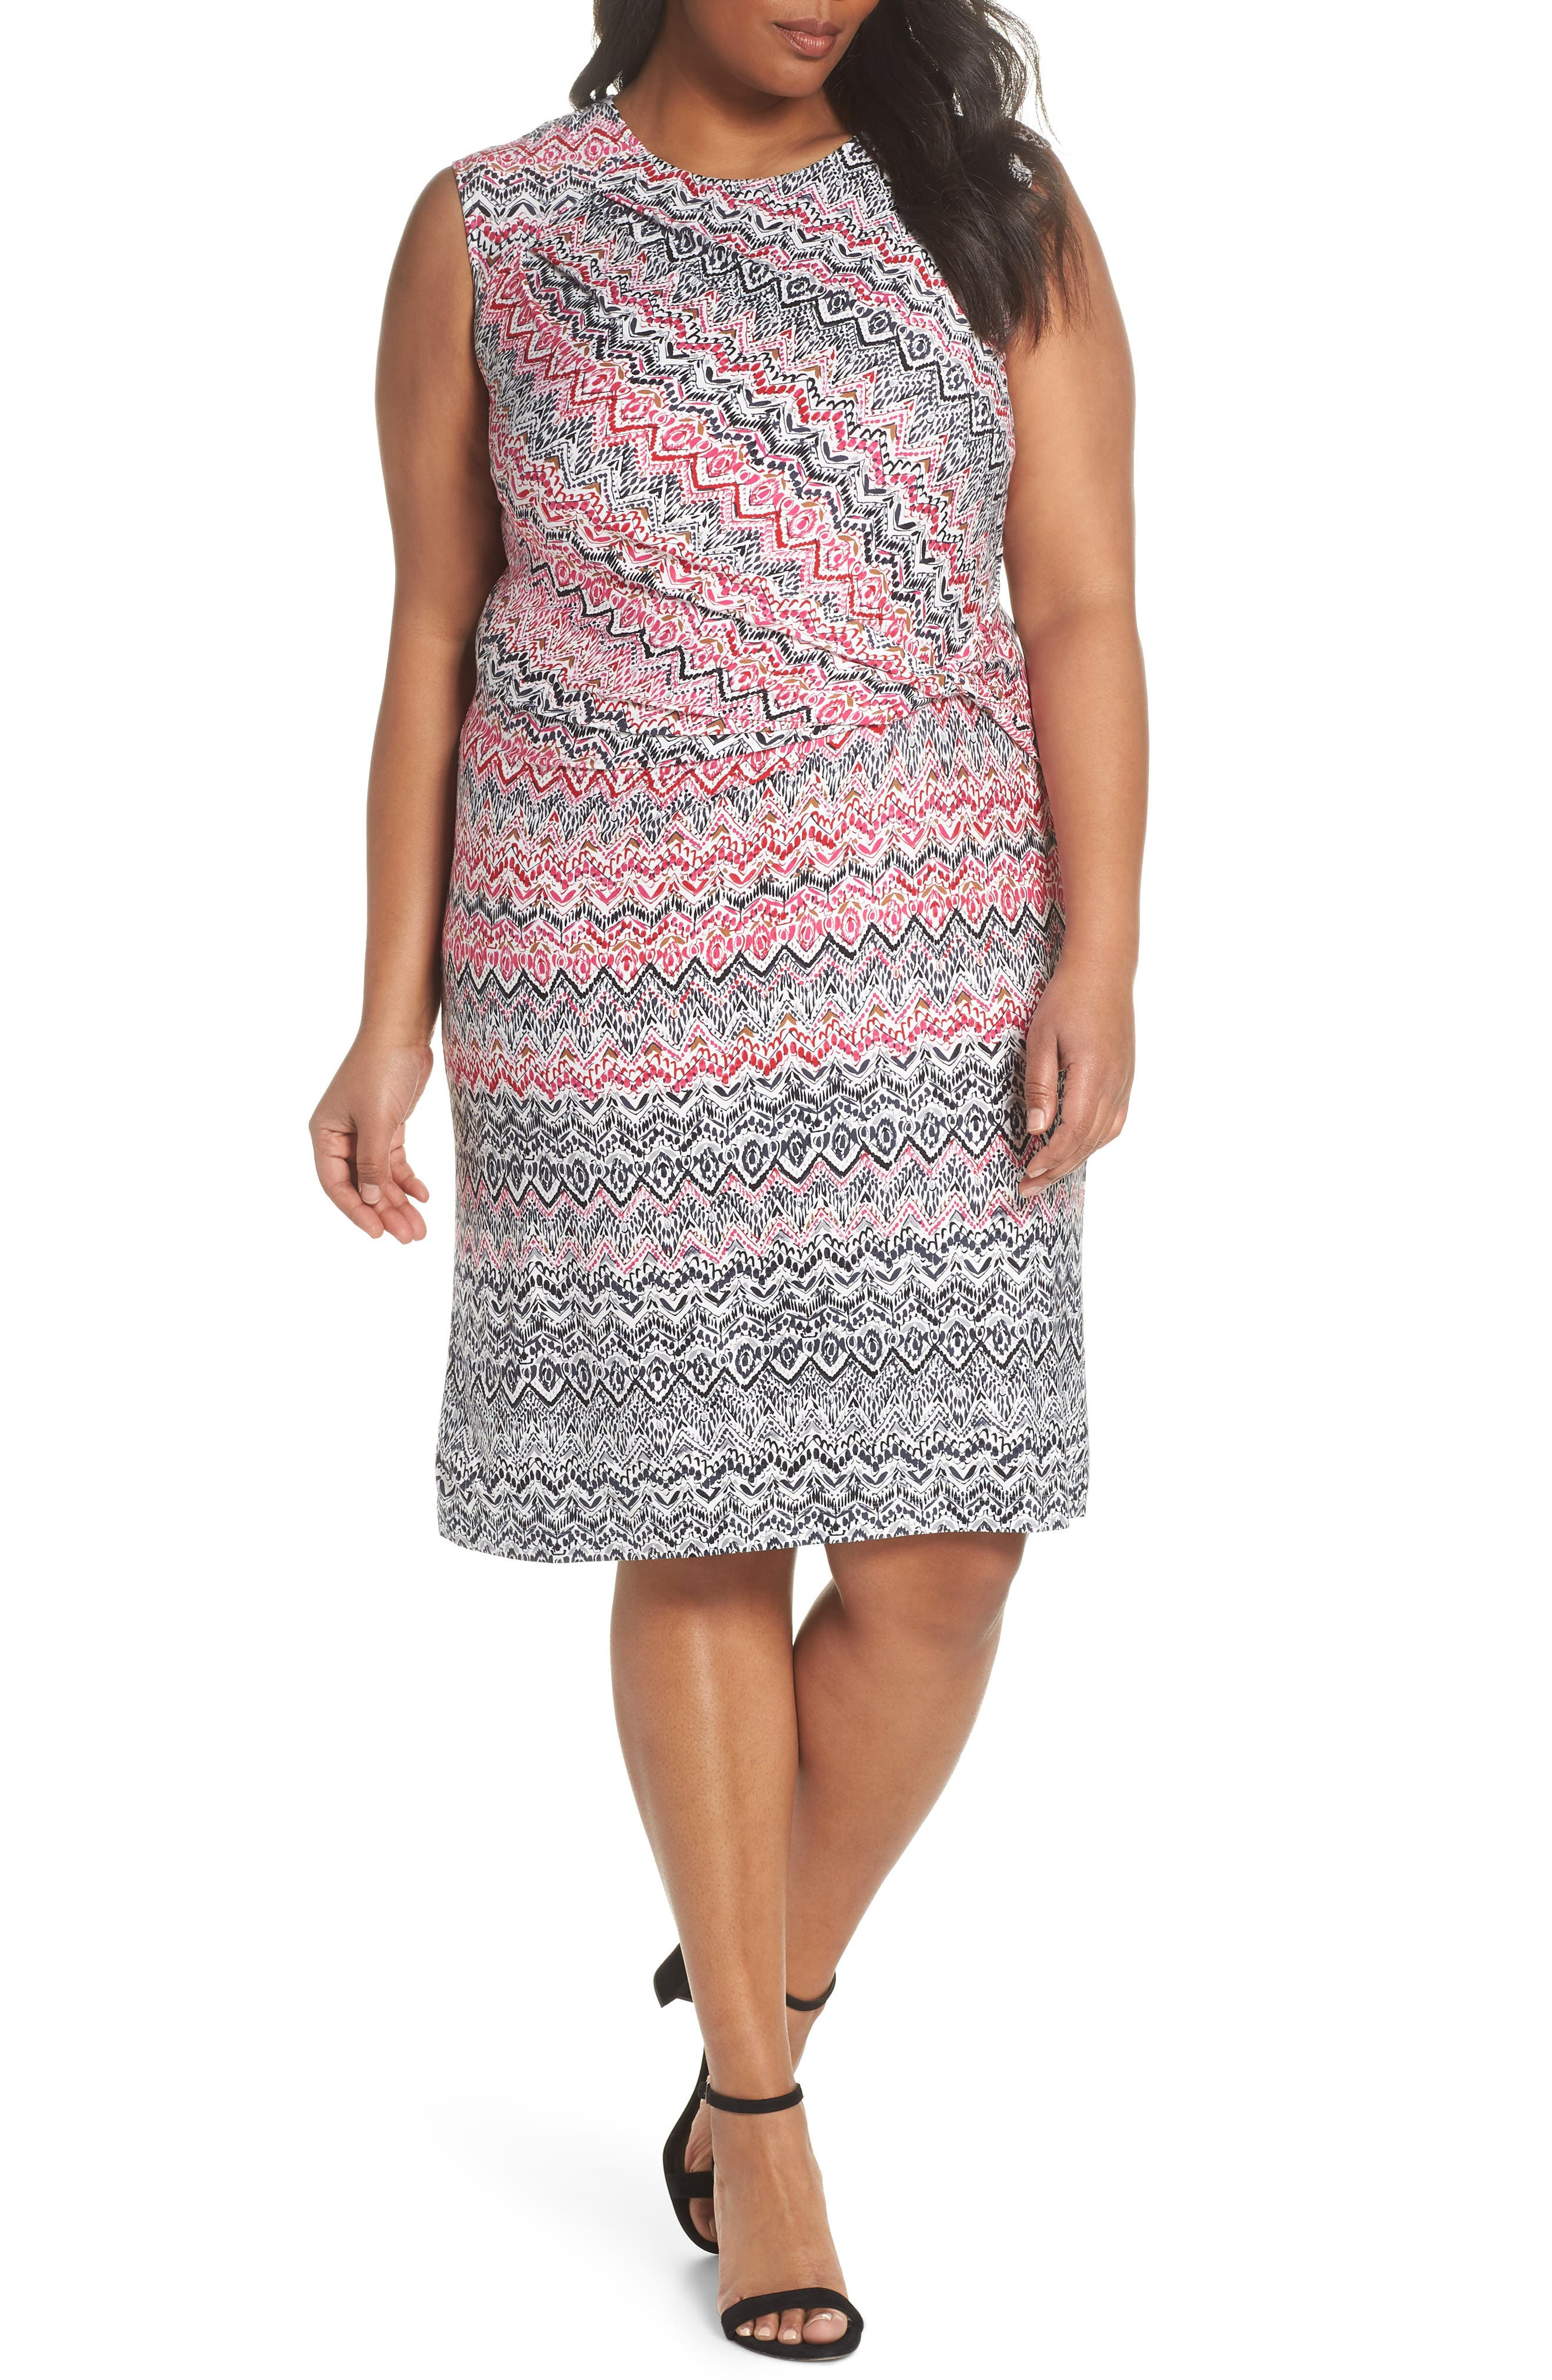 Main Image - NIC+ZOE Spiced Up Twist Sheath Dress (Plus Size)